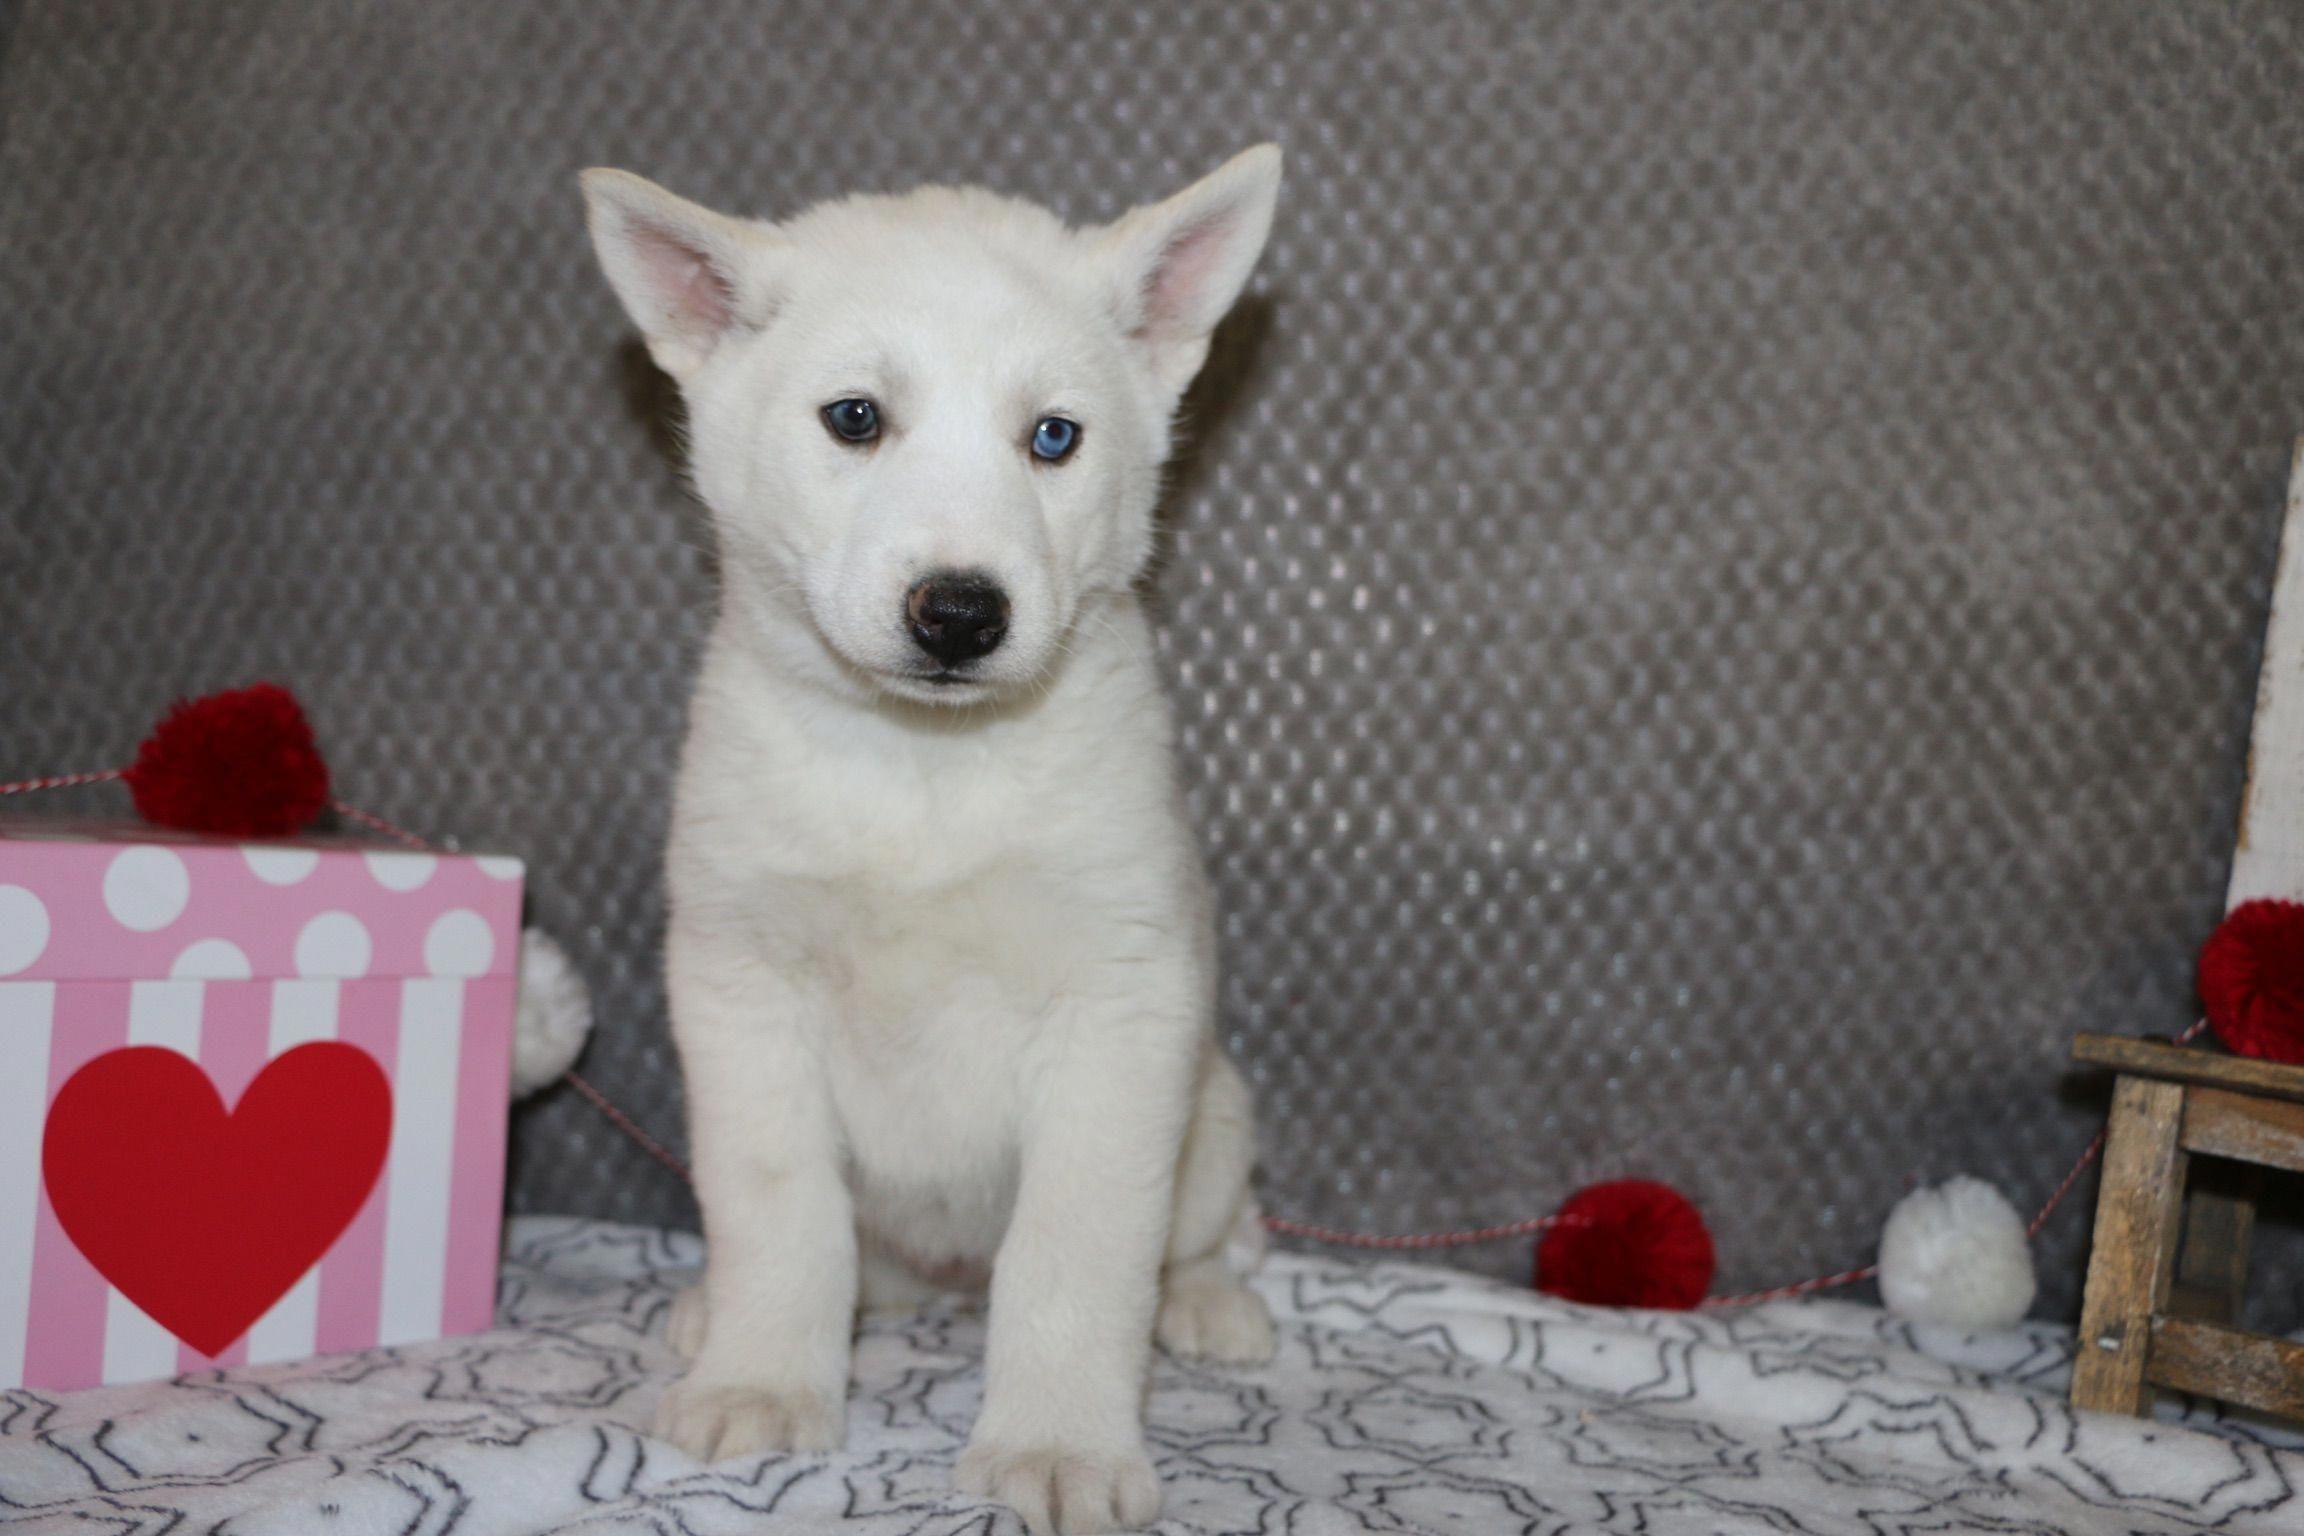 Snowy A Smart Female Akc Siberian Husky Puppy For Sale In Indiana Find Cute Siberian Husky Puppies And Res Husky Puppies For Sale Husky Puppy Siberian Husky